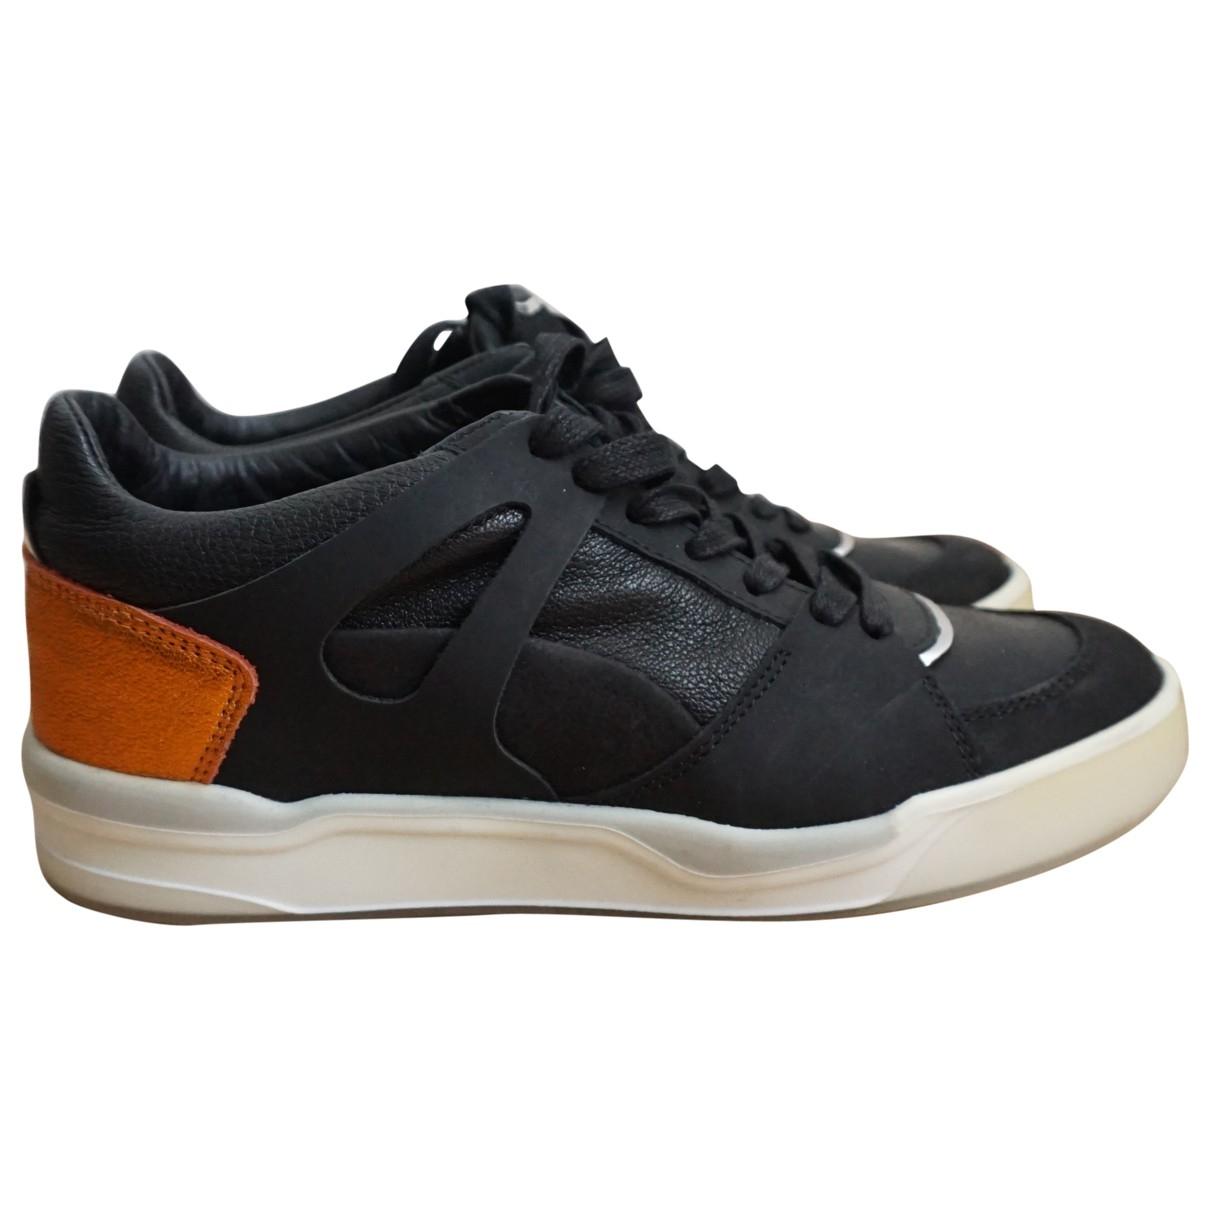 Alexander Mcqueen For Puma - Baskets   pour femme en cuir - noir